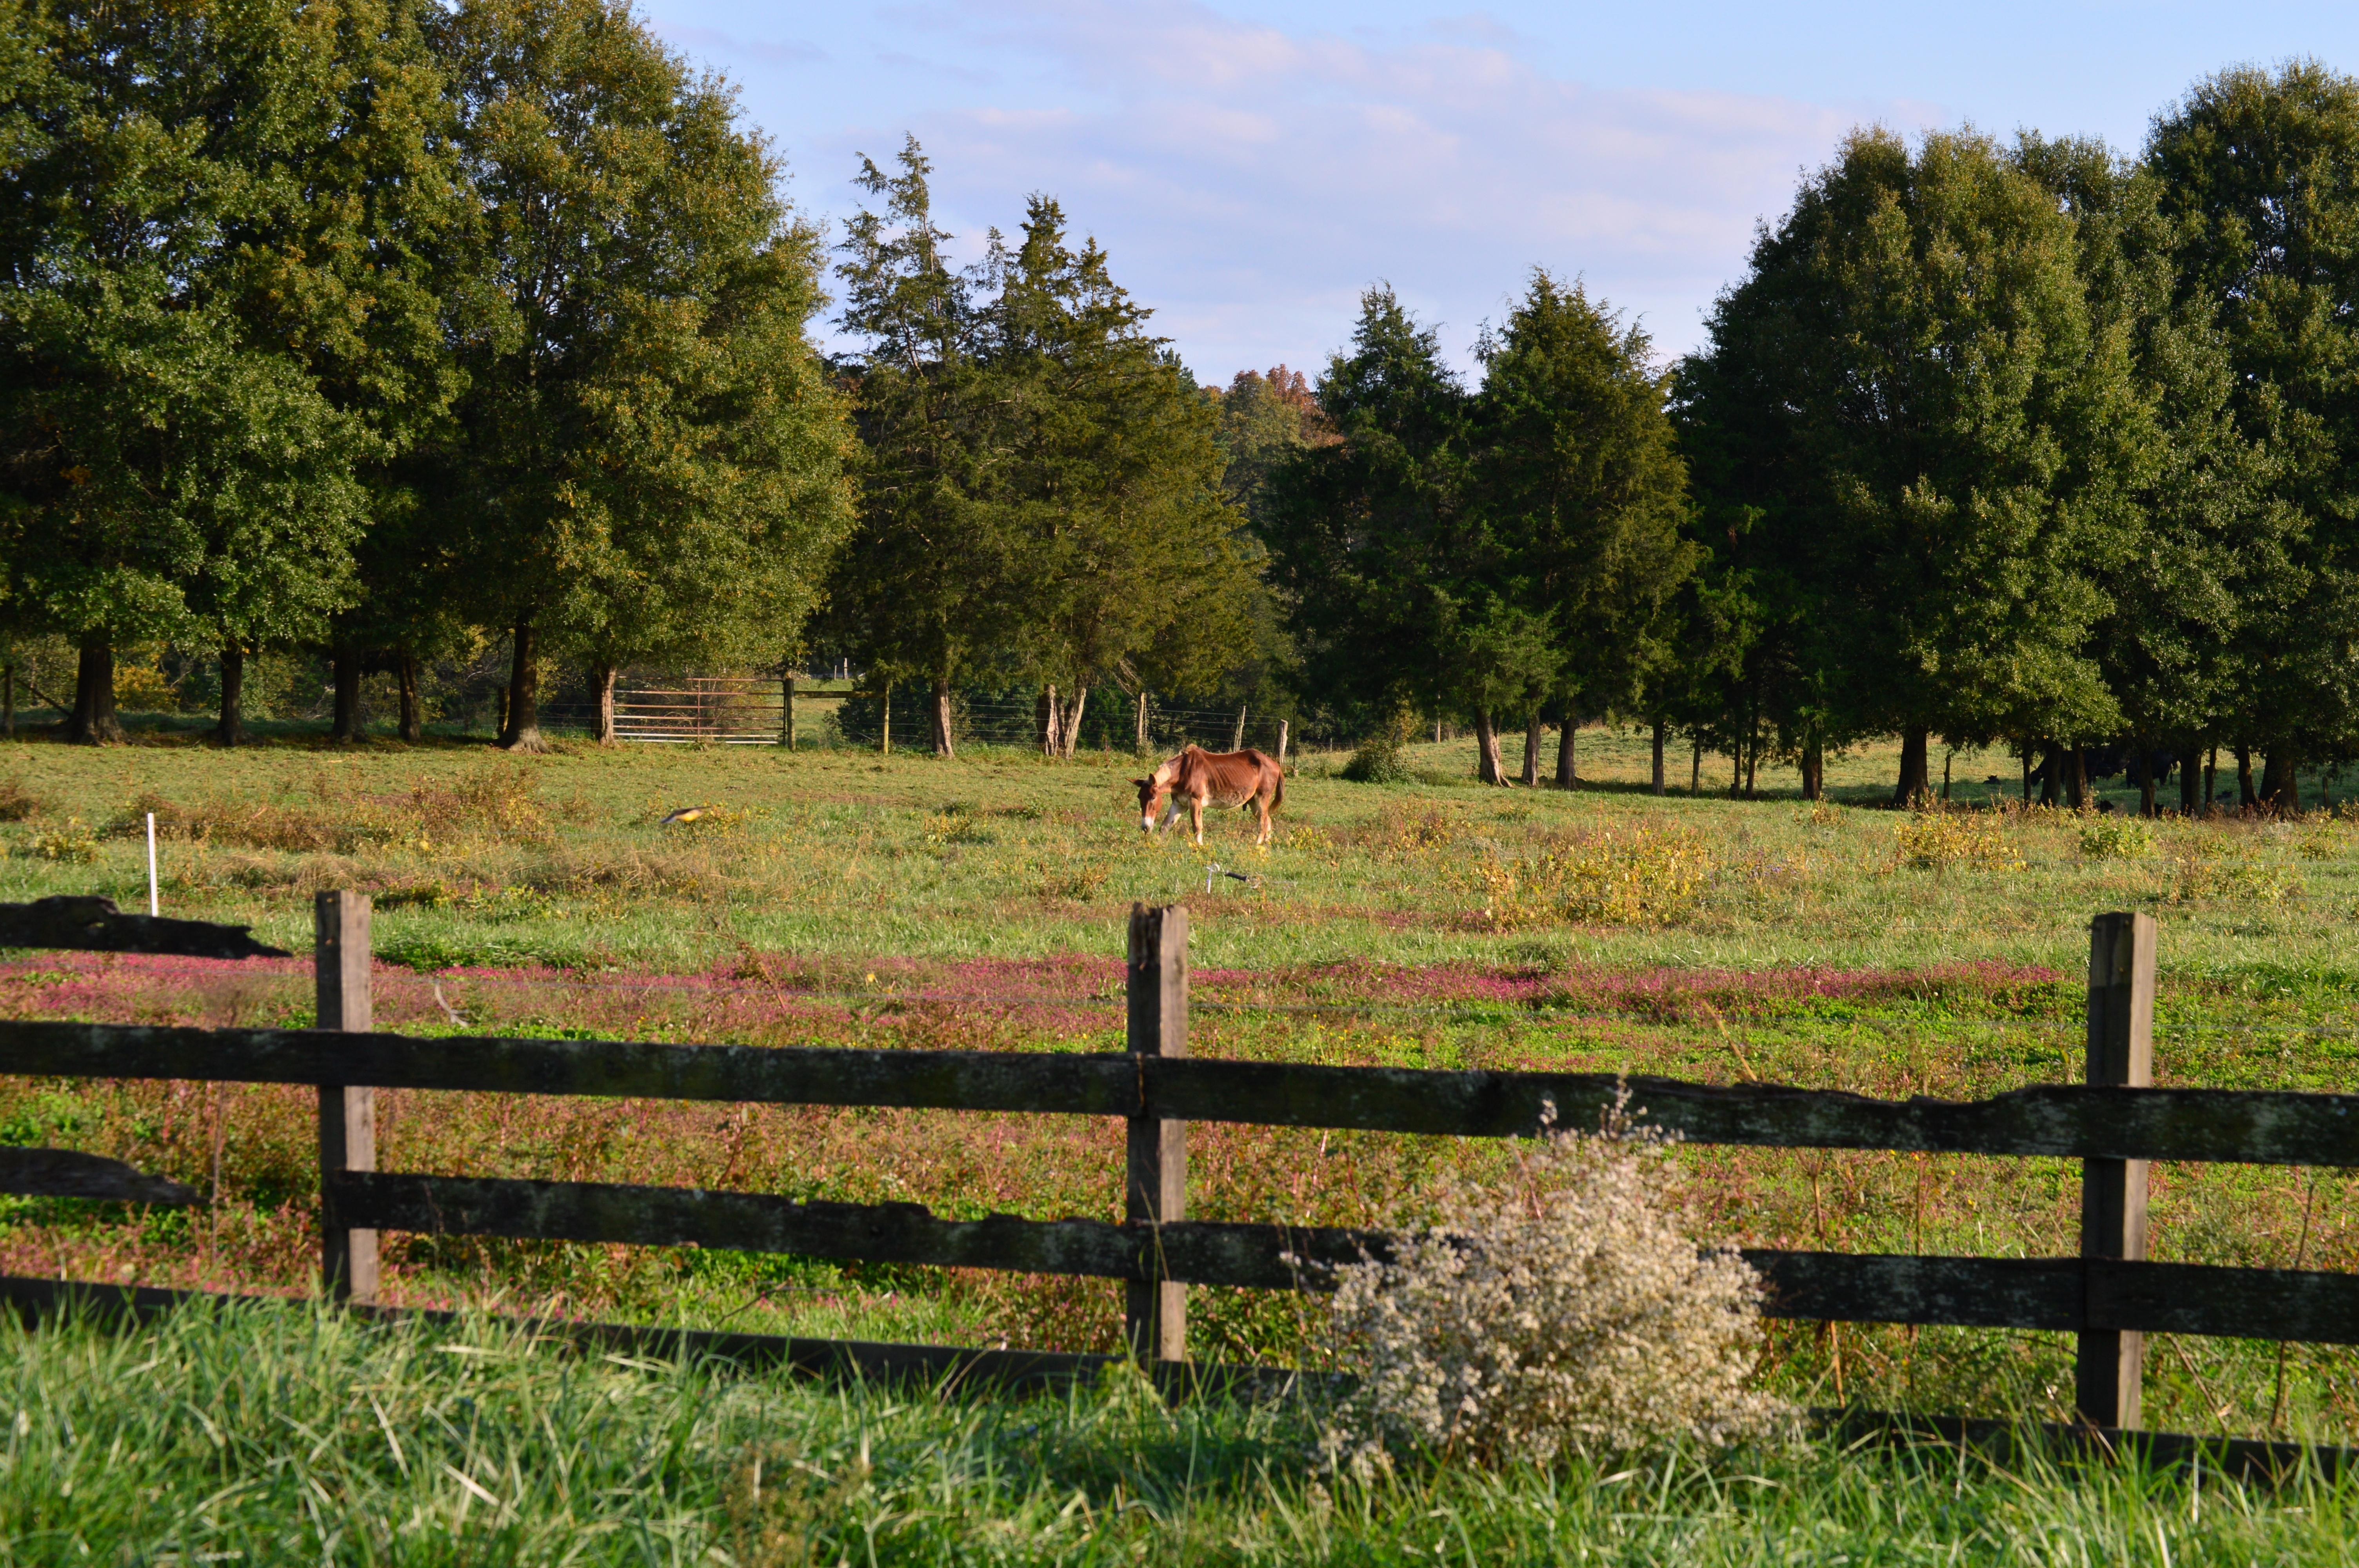 Mule Grazing